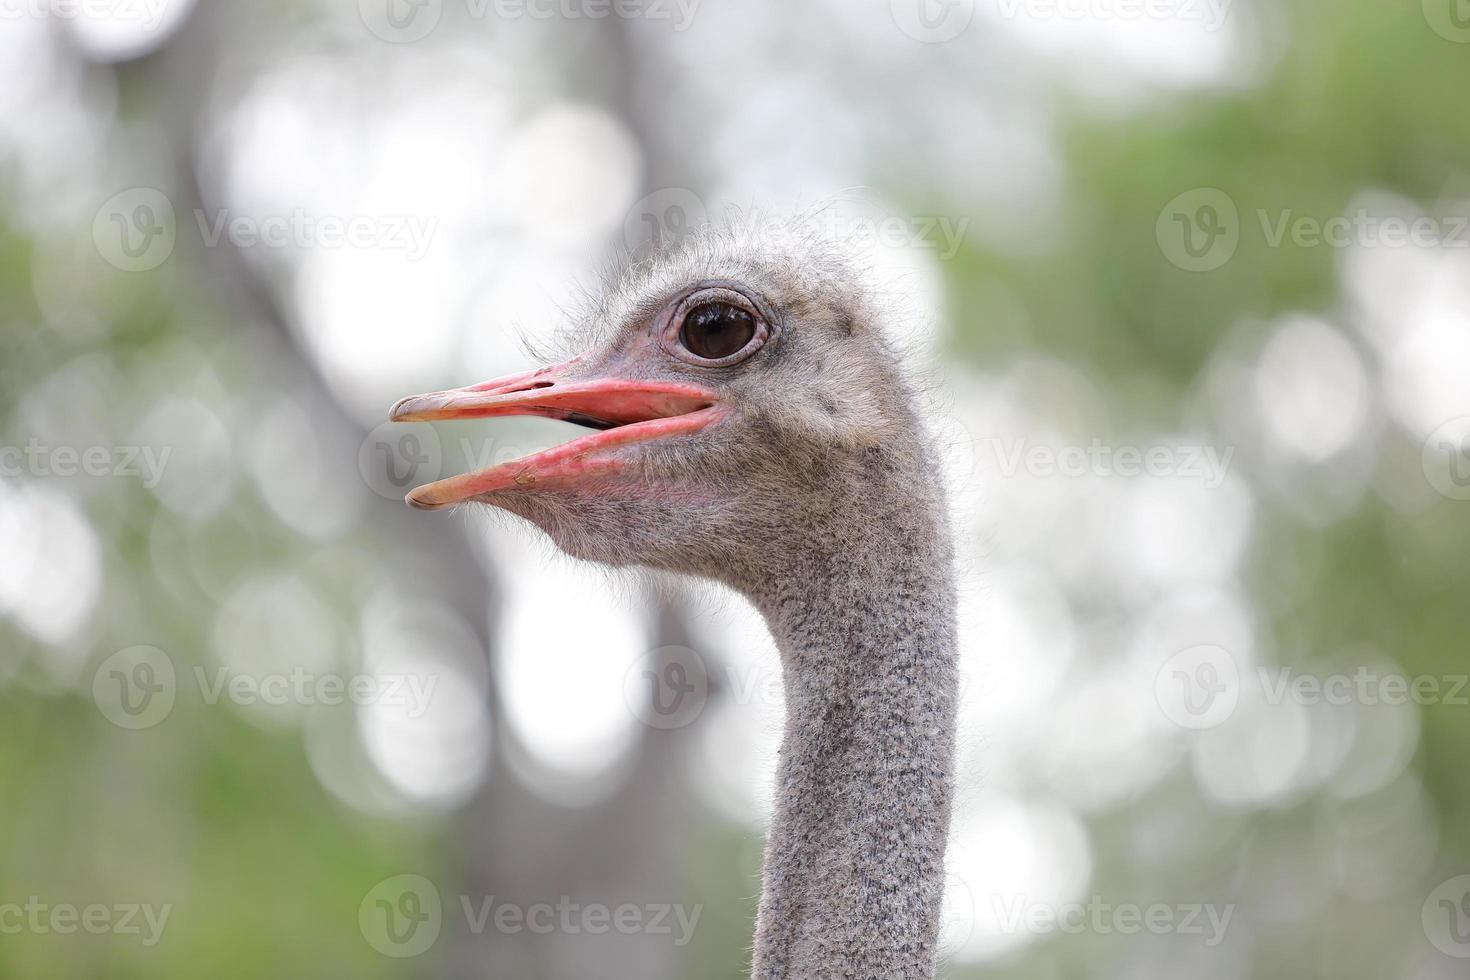 cerca de la cabeza de avestruz foto